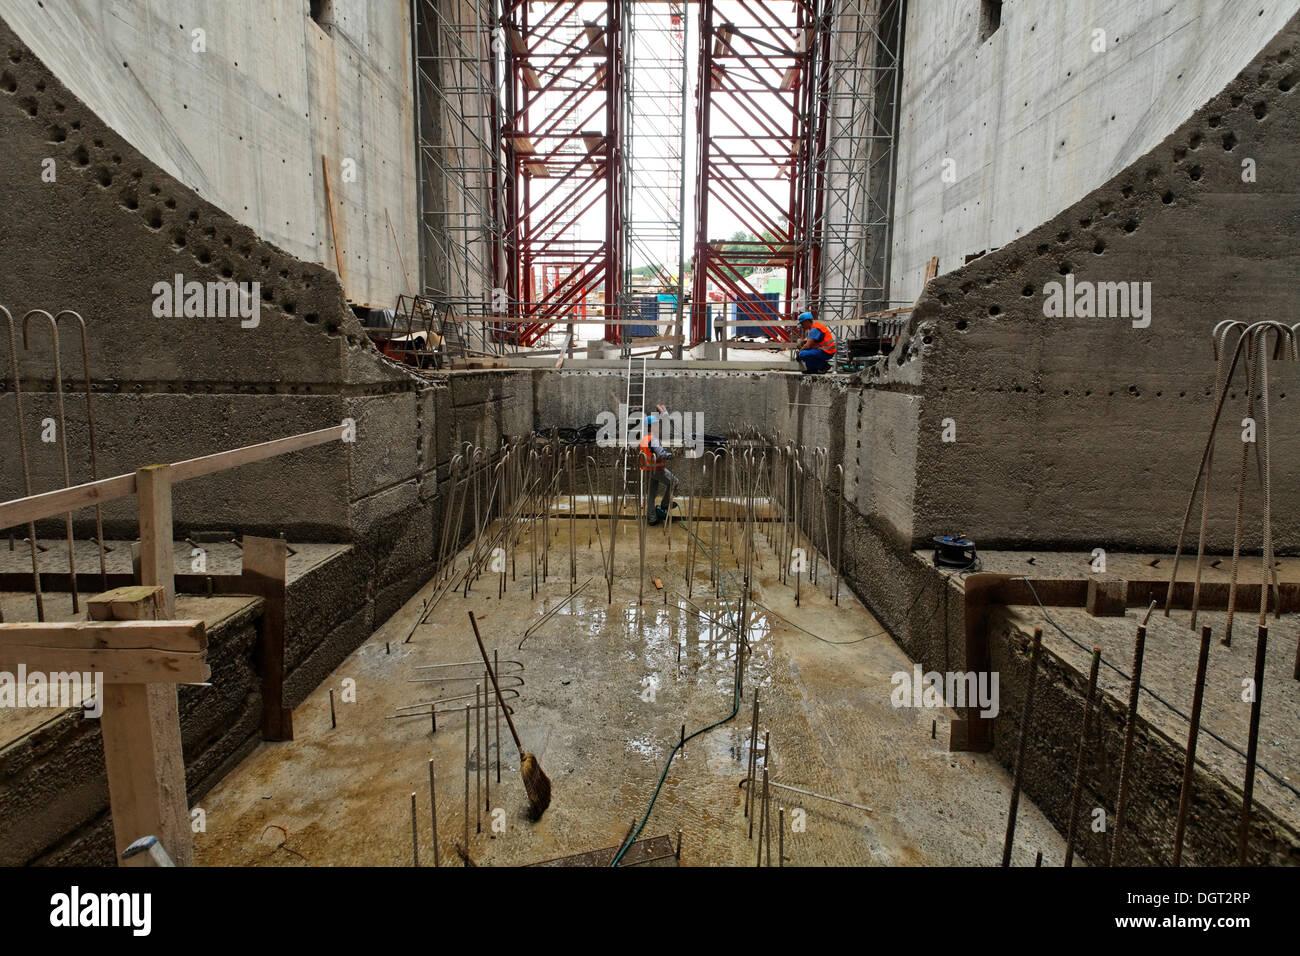 Construction site of the new hydropower plant in Rheinfelden, turbine chamber, chamber 3, concreting work, Rheinfelden Stock Photo